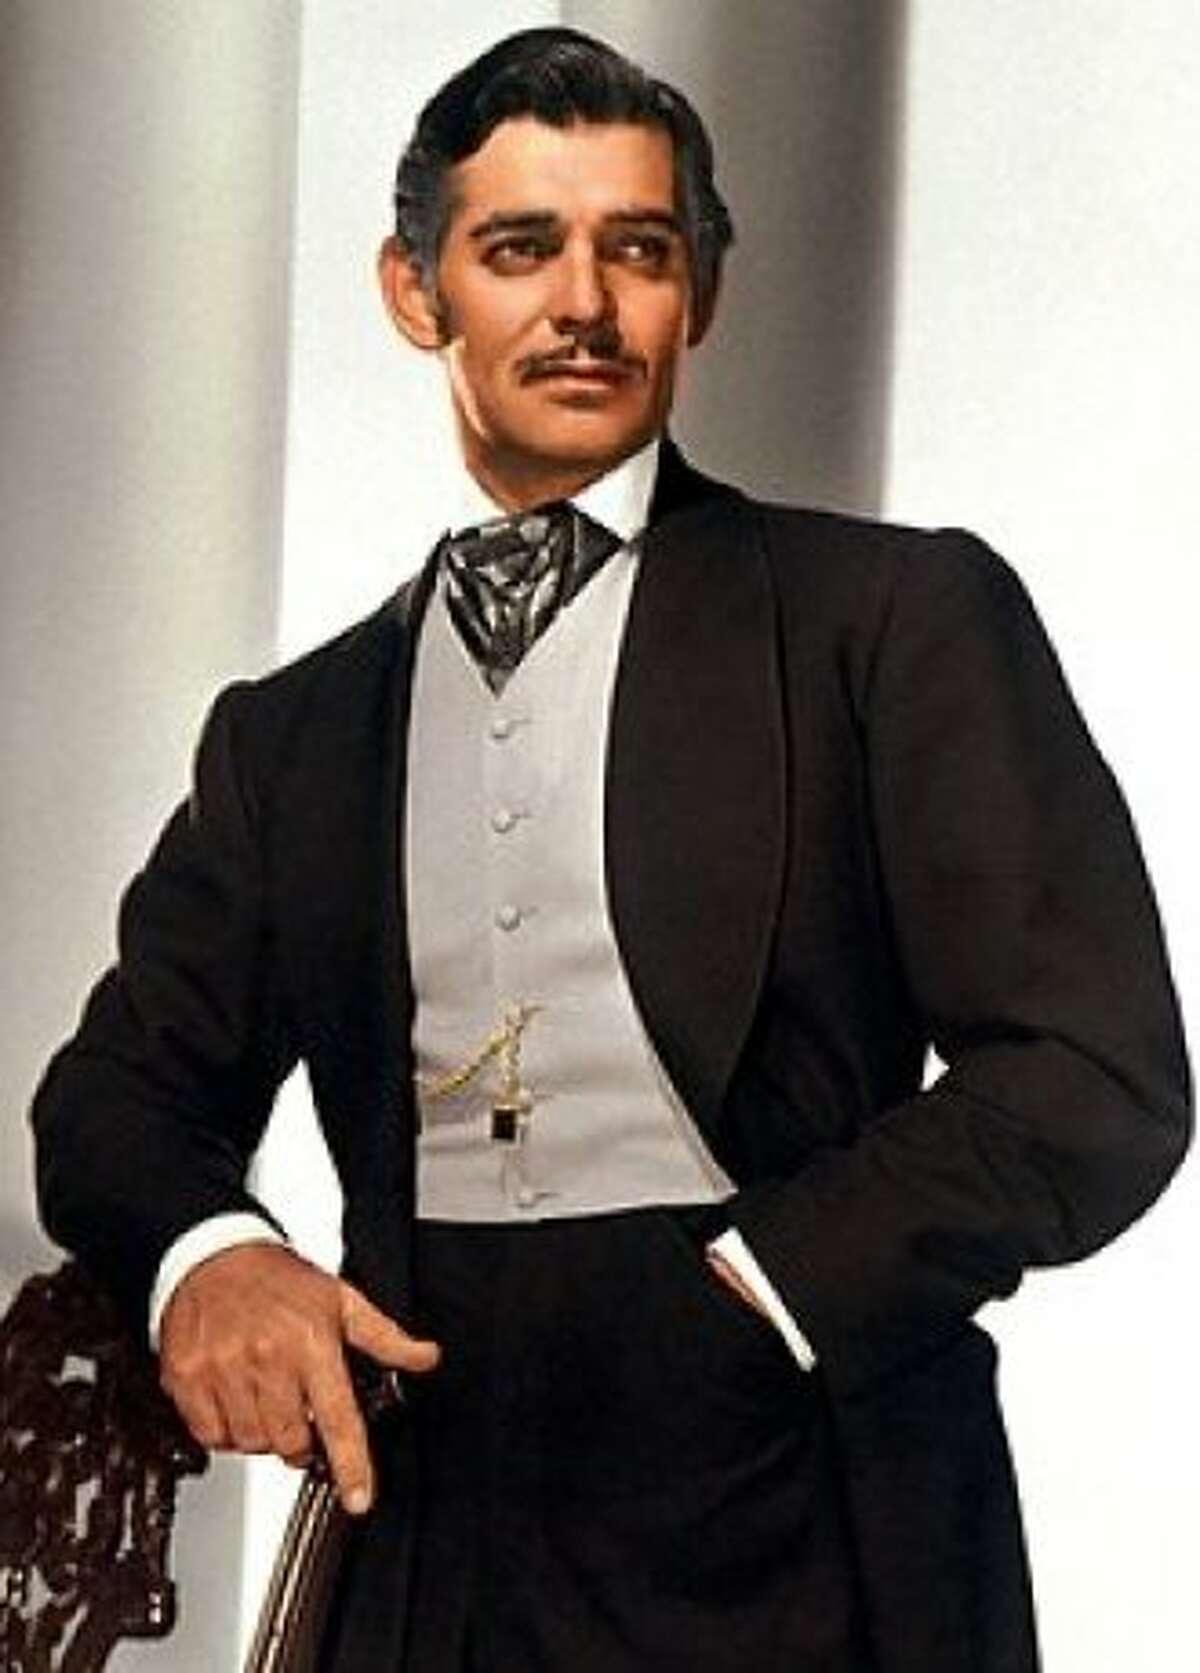 Clark Gable as Rhett Butler in